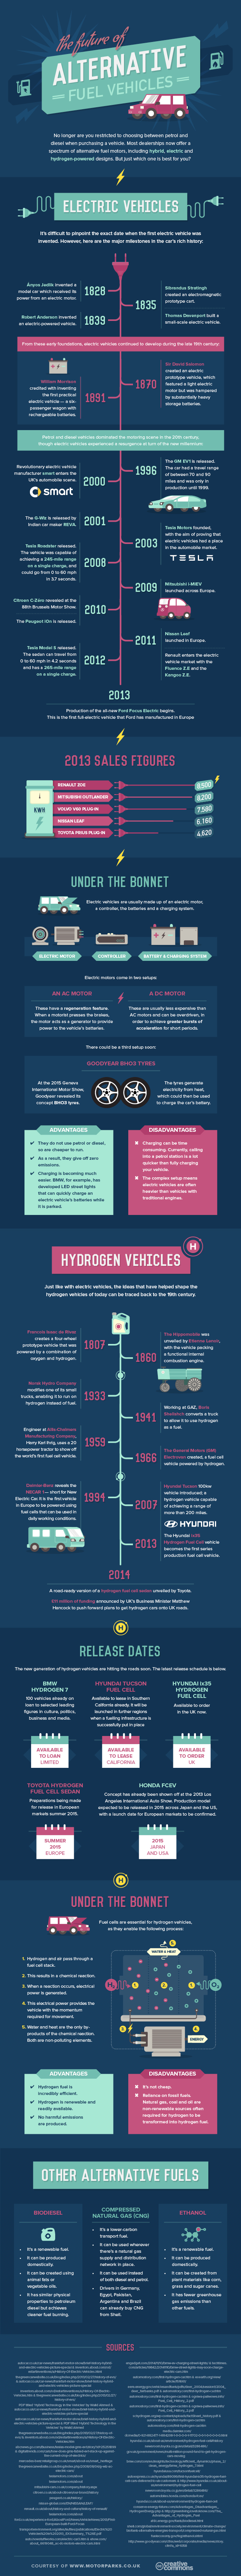 The future of Alternative fuels - v2